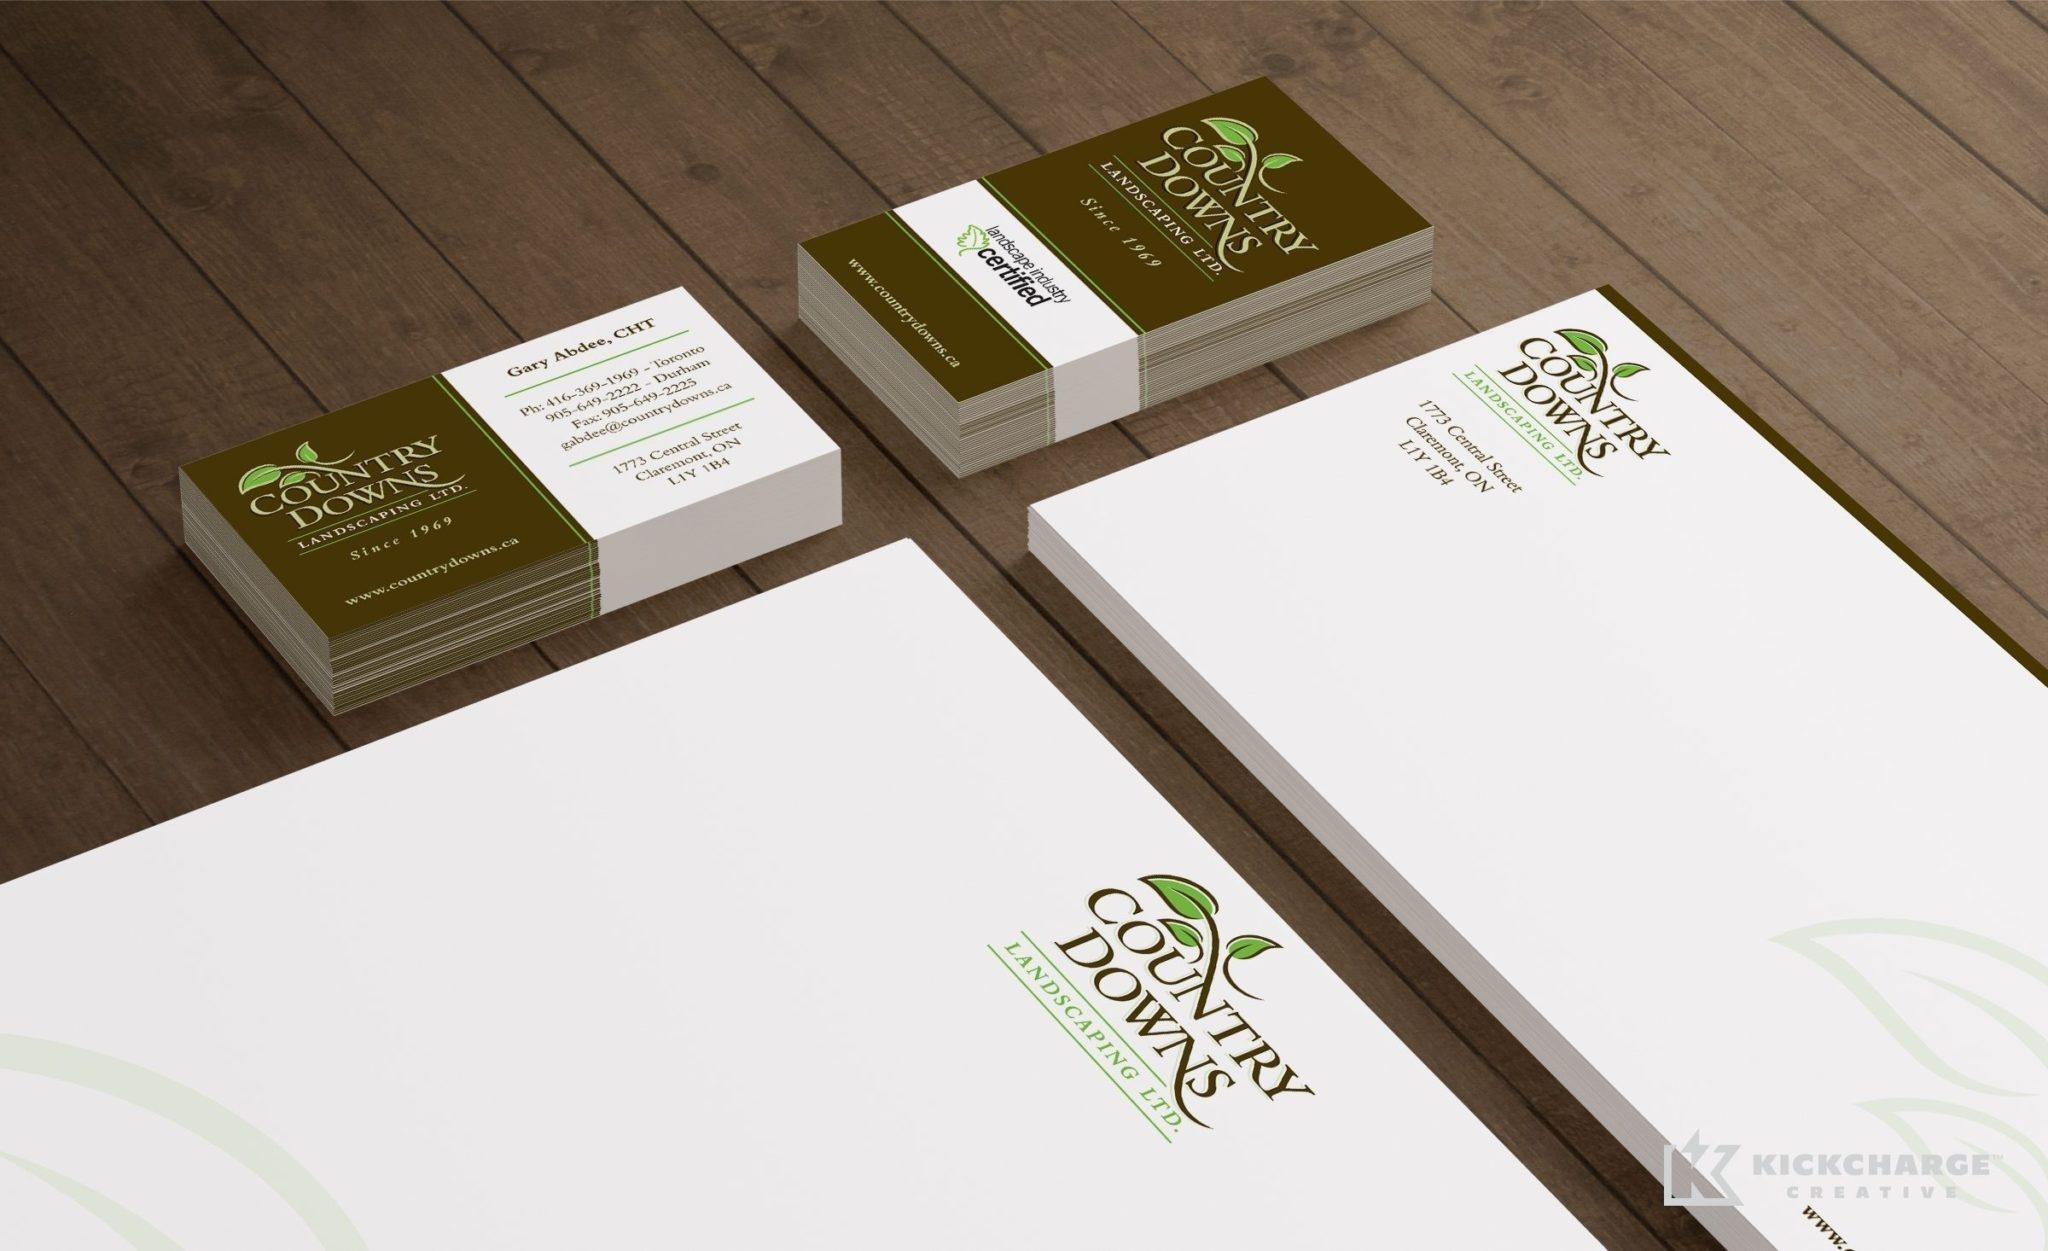 Stationery design for a landscape company in Toronto, Canada.